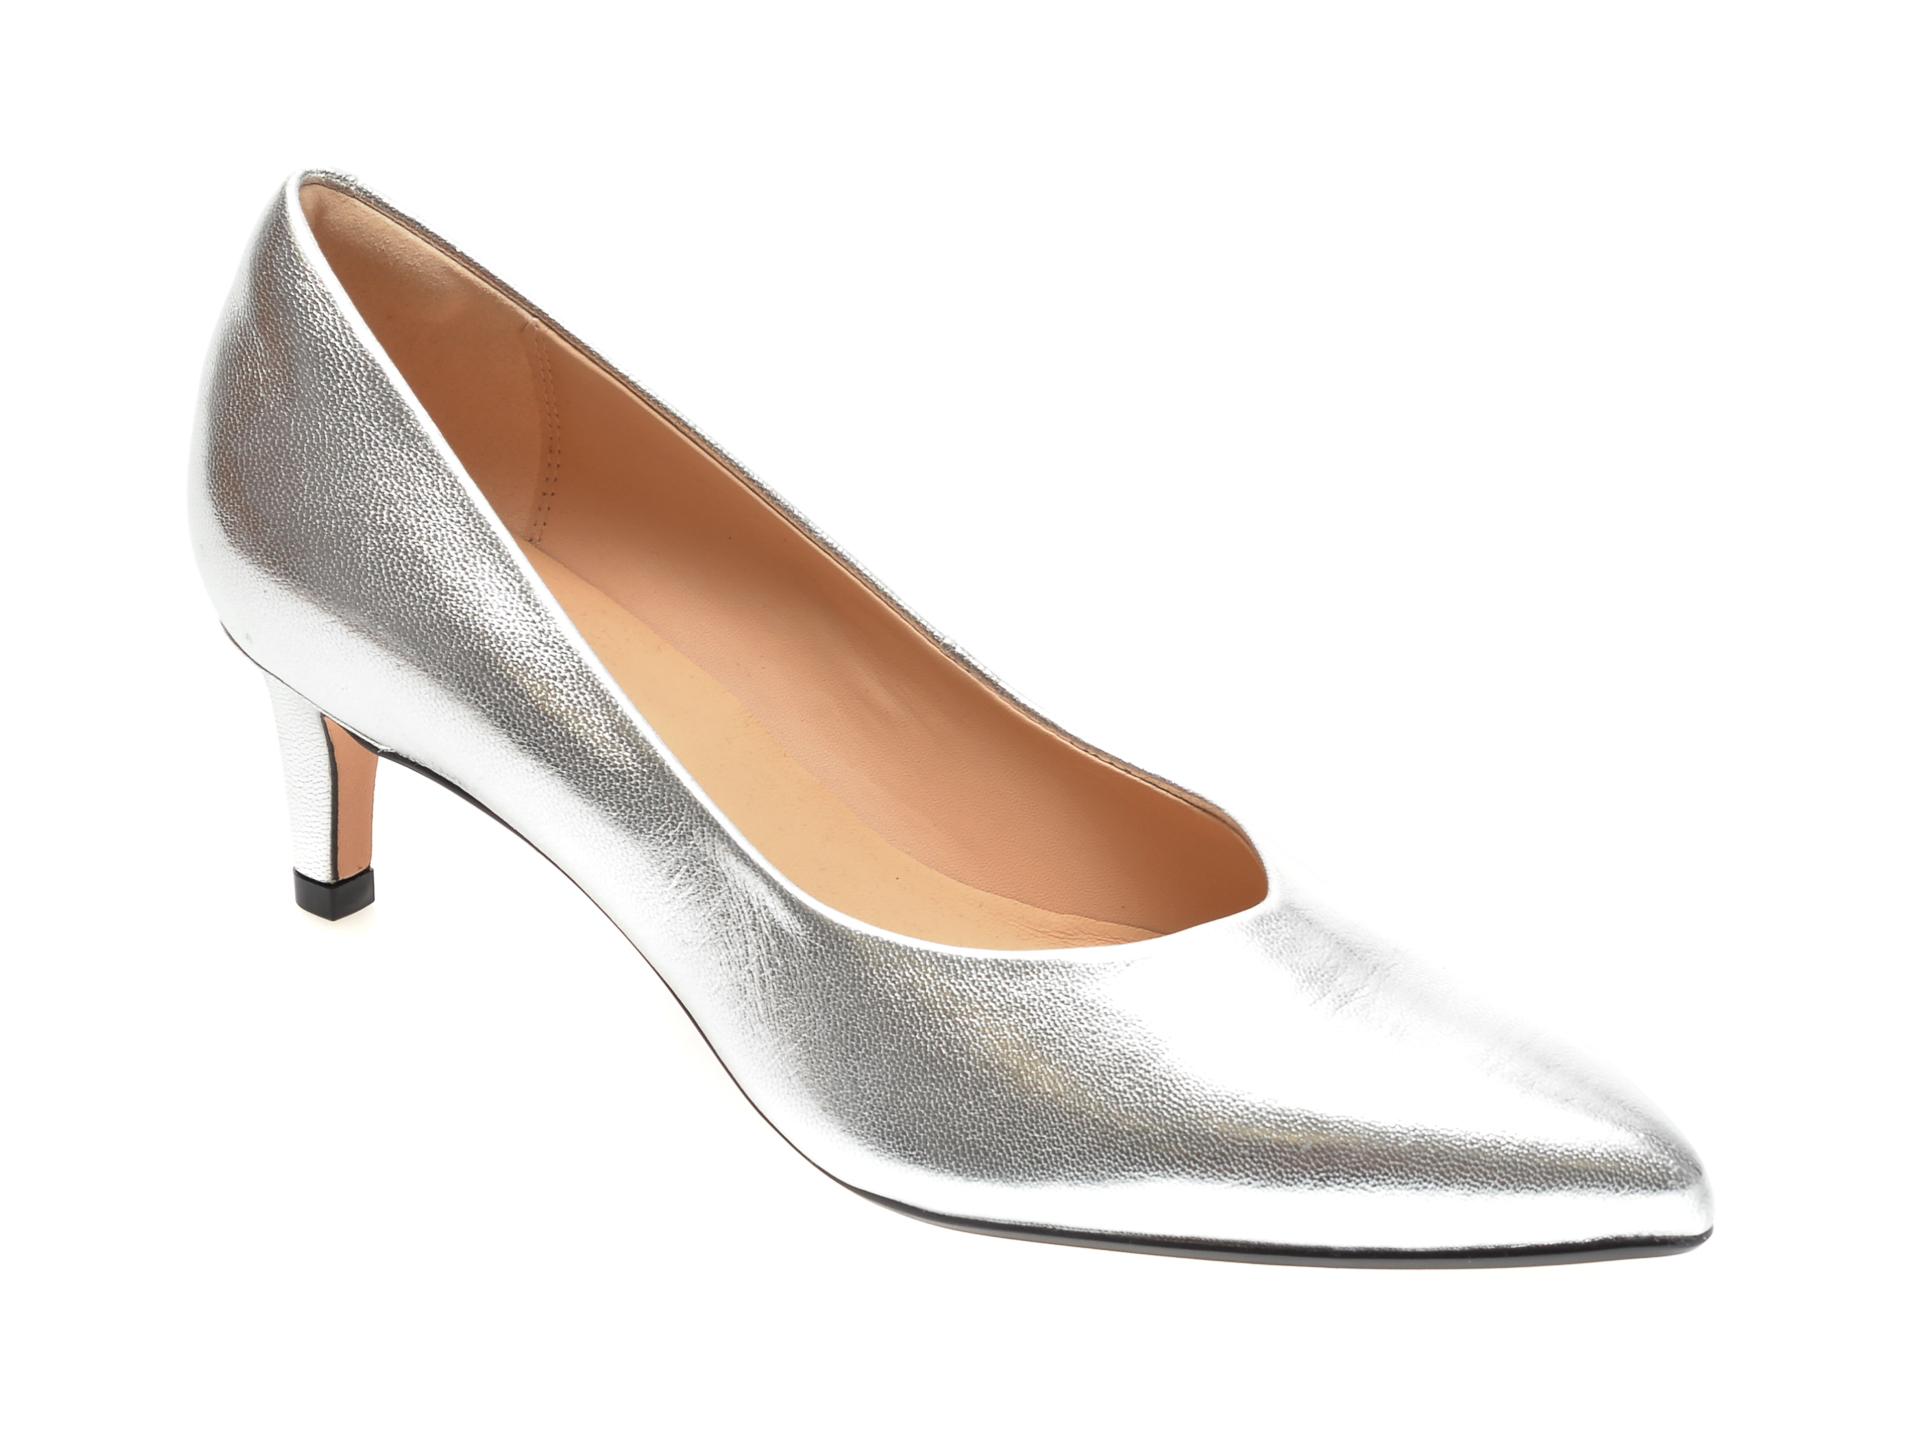 Pantofi CLARKS argintii, LAI55C2, din piele naturala lacuita